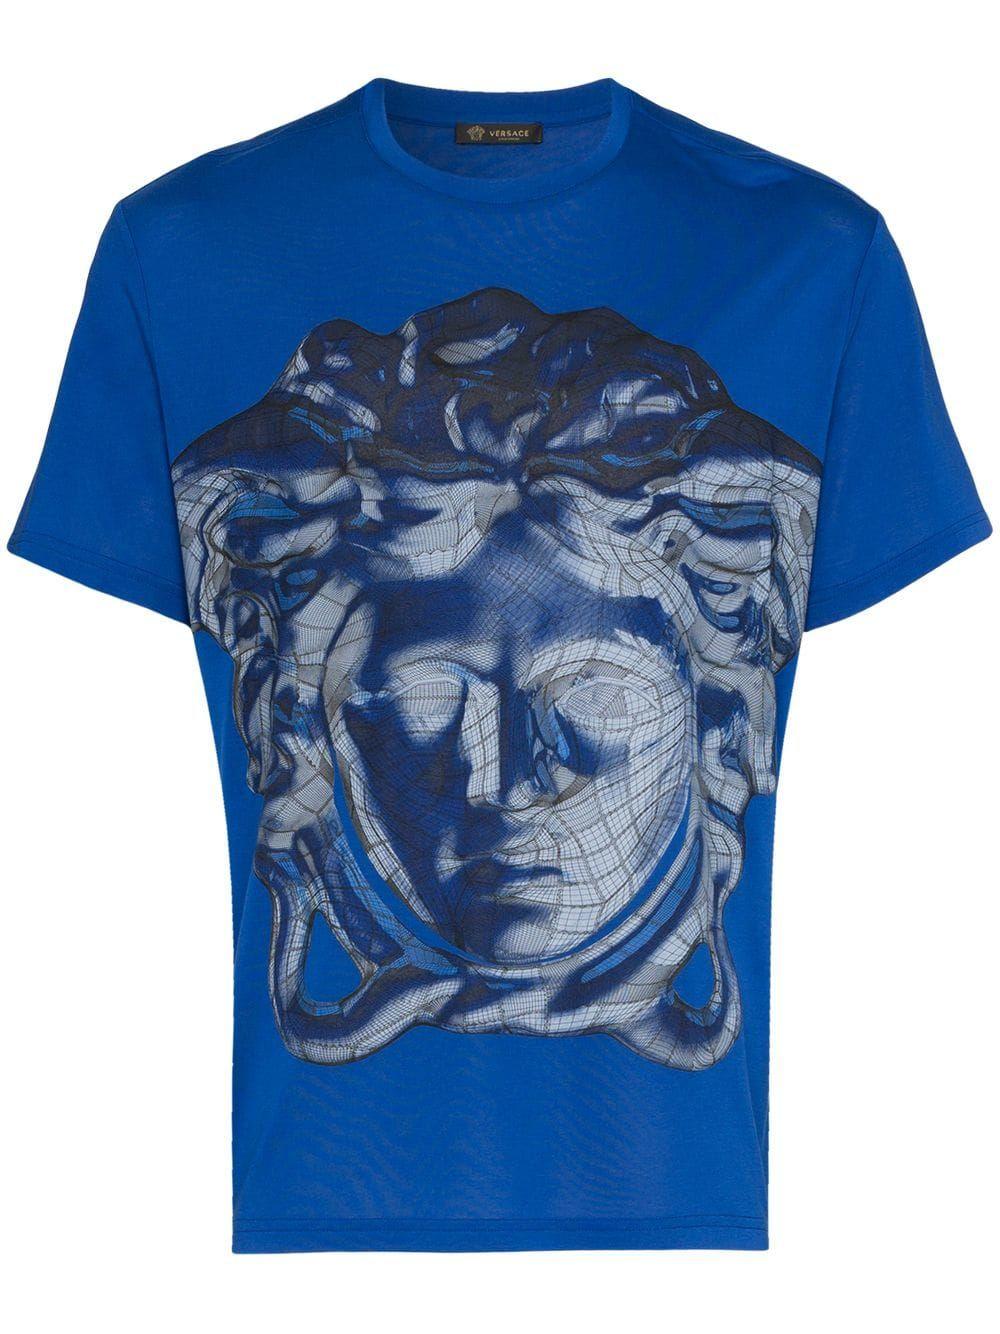 5770fdacc VERSACE VERSACE MEDUSA GRAPHIC PRINT T-SHIRT - BLUE. #versace #cloth ...